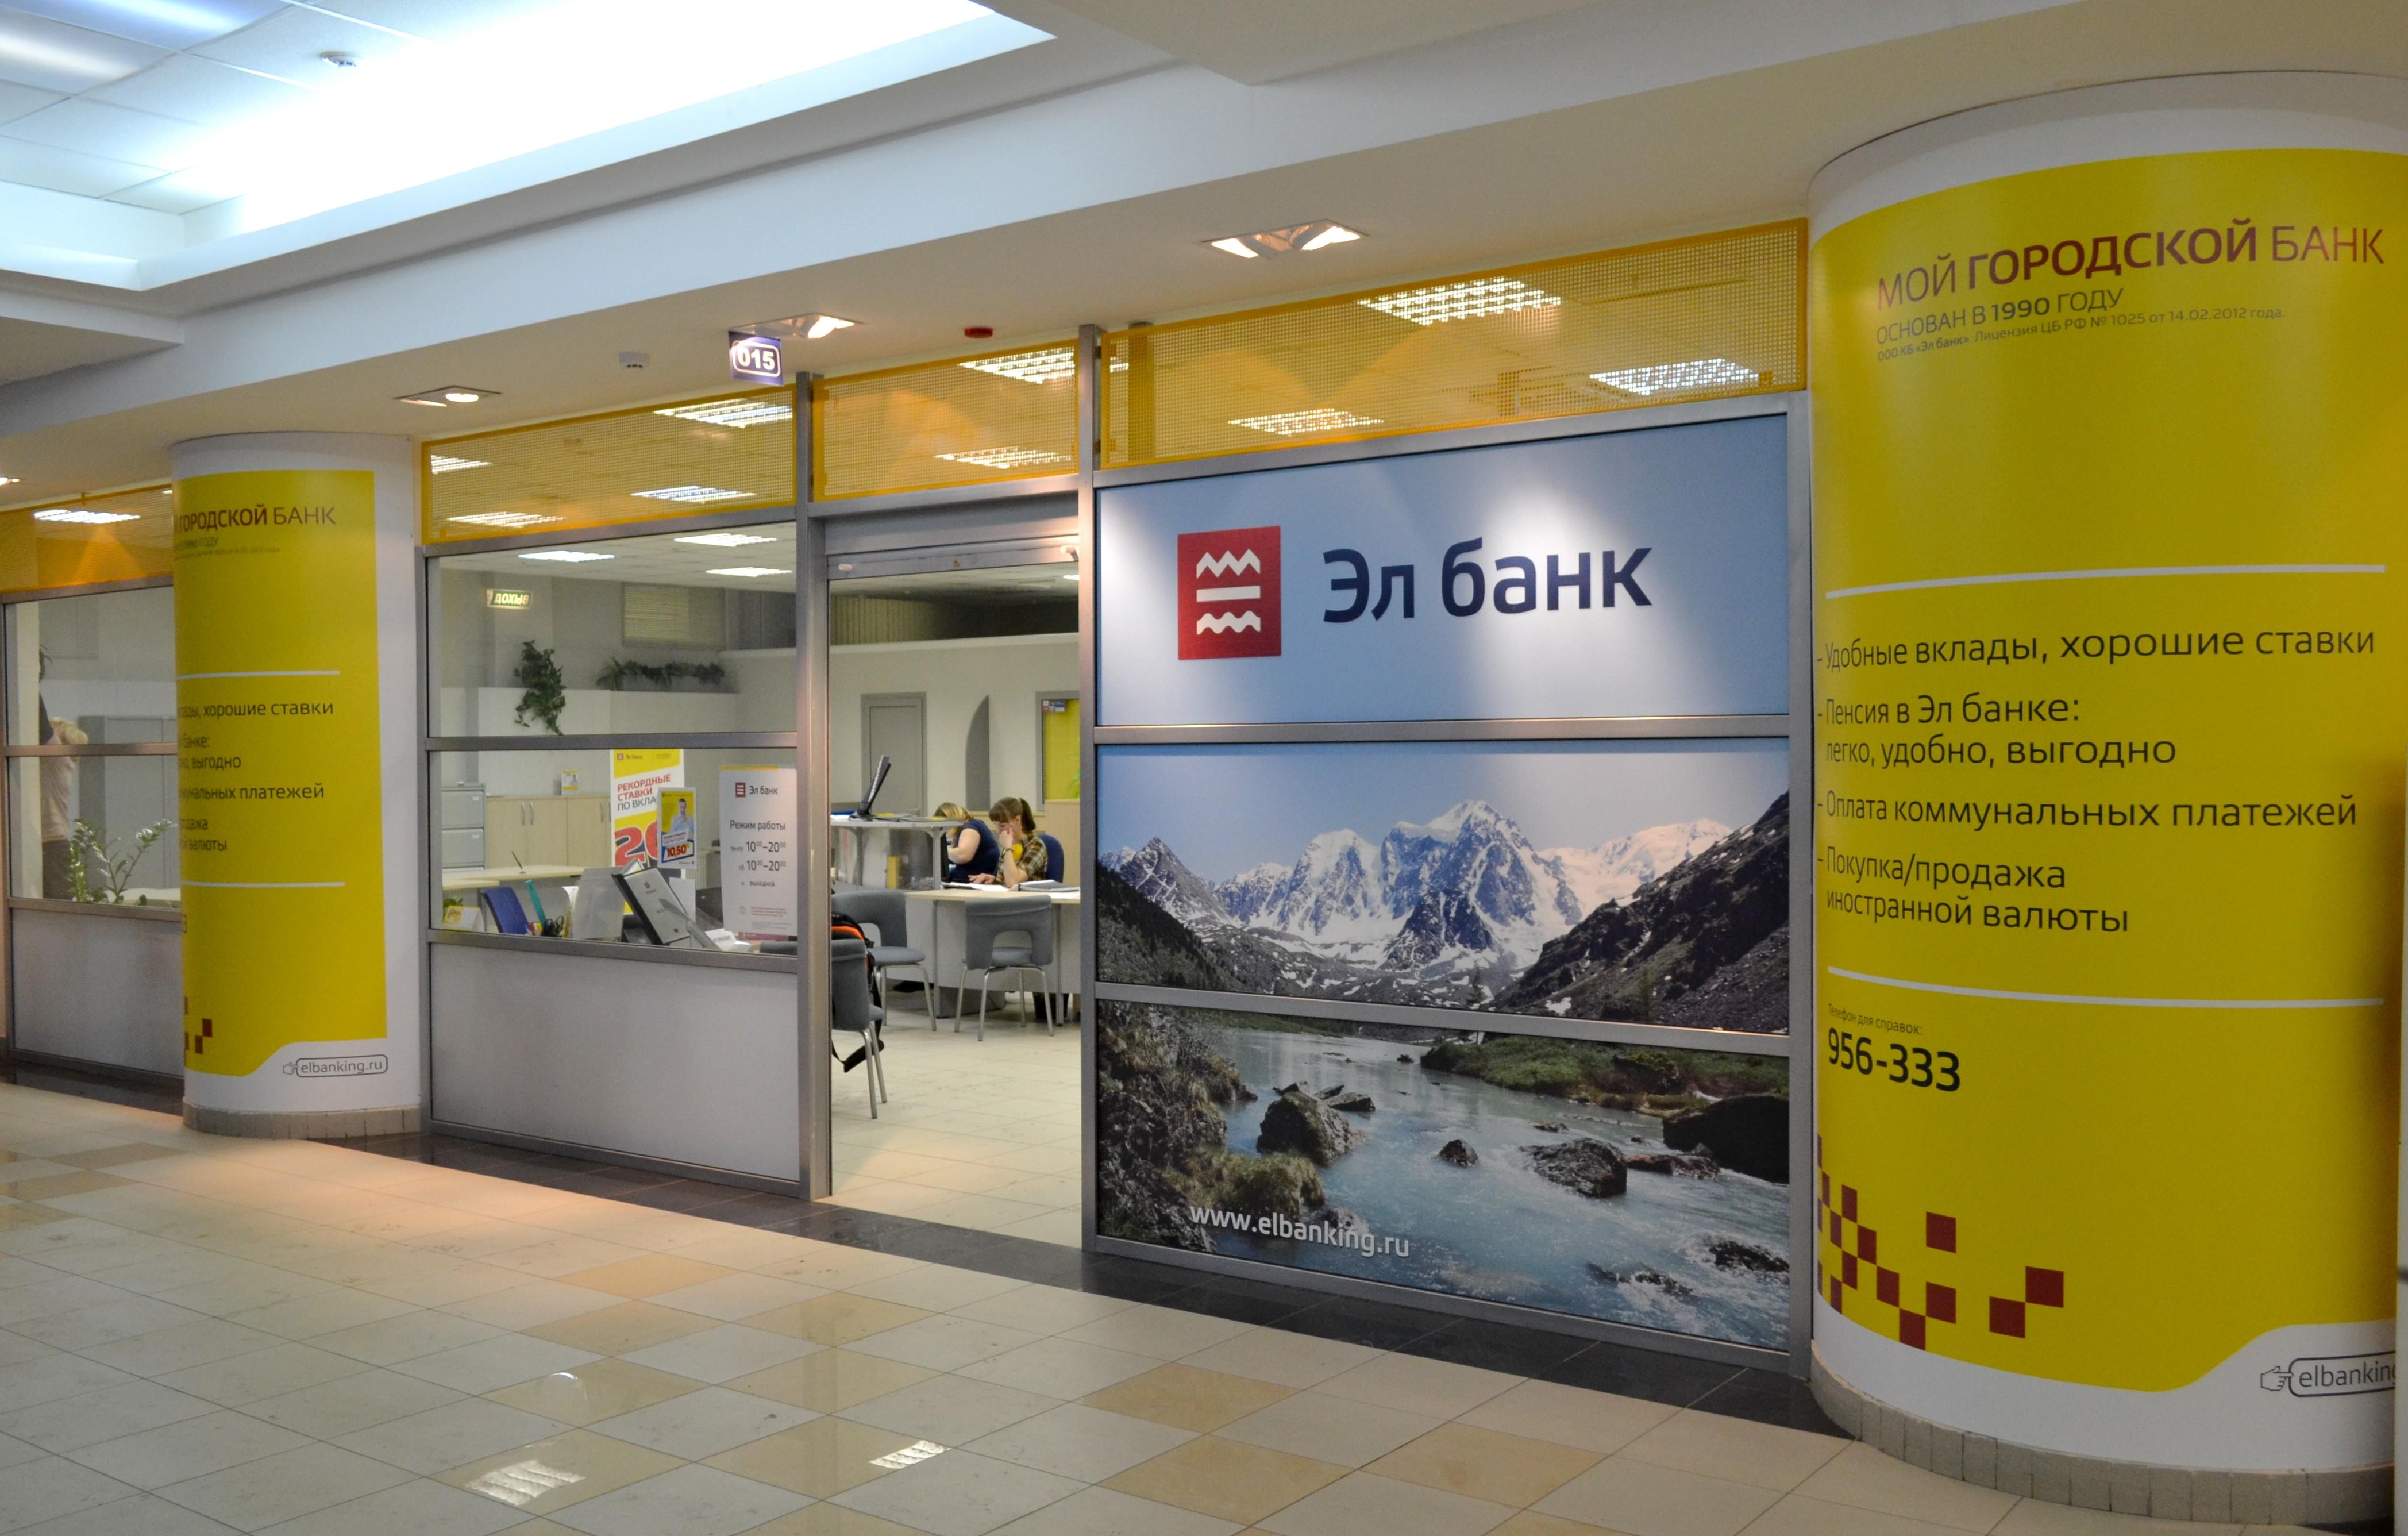 Работа Эл банка приостановлена